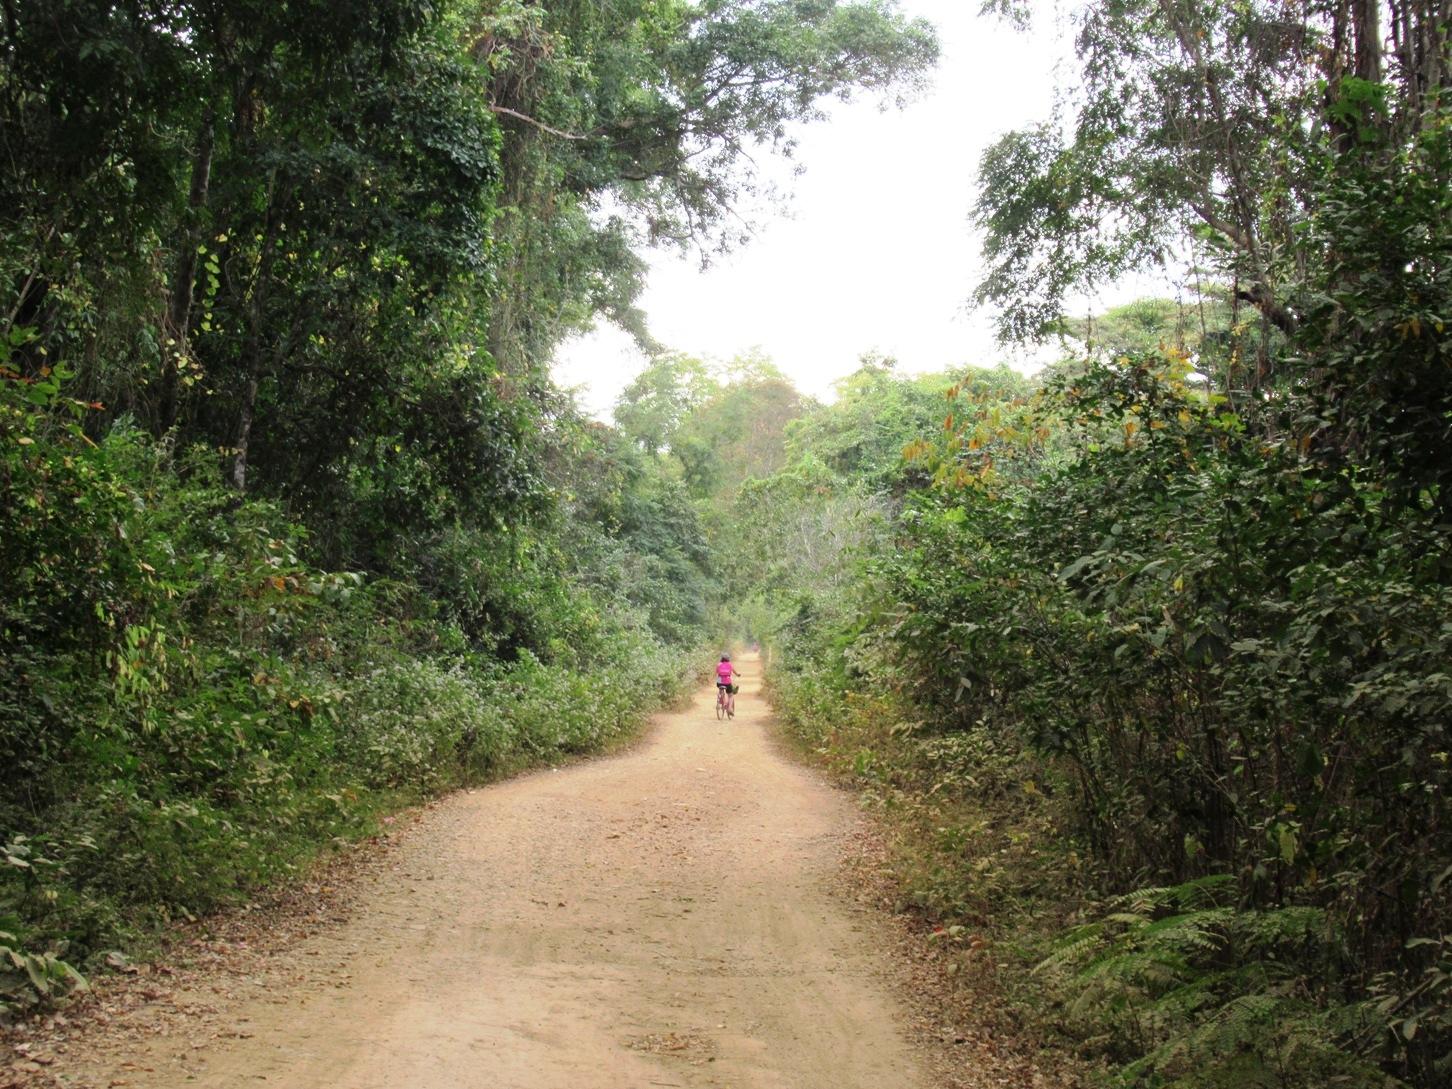 2019-12-laos-si-phan-don-Khone-12-ban-hang-khon-bici-vuelta-al-norte